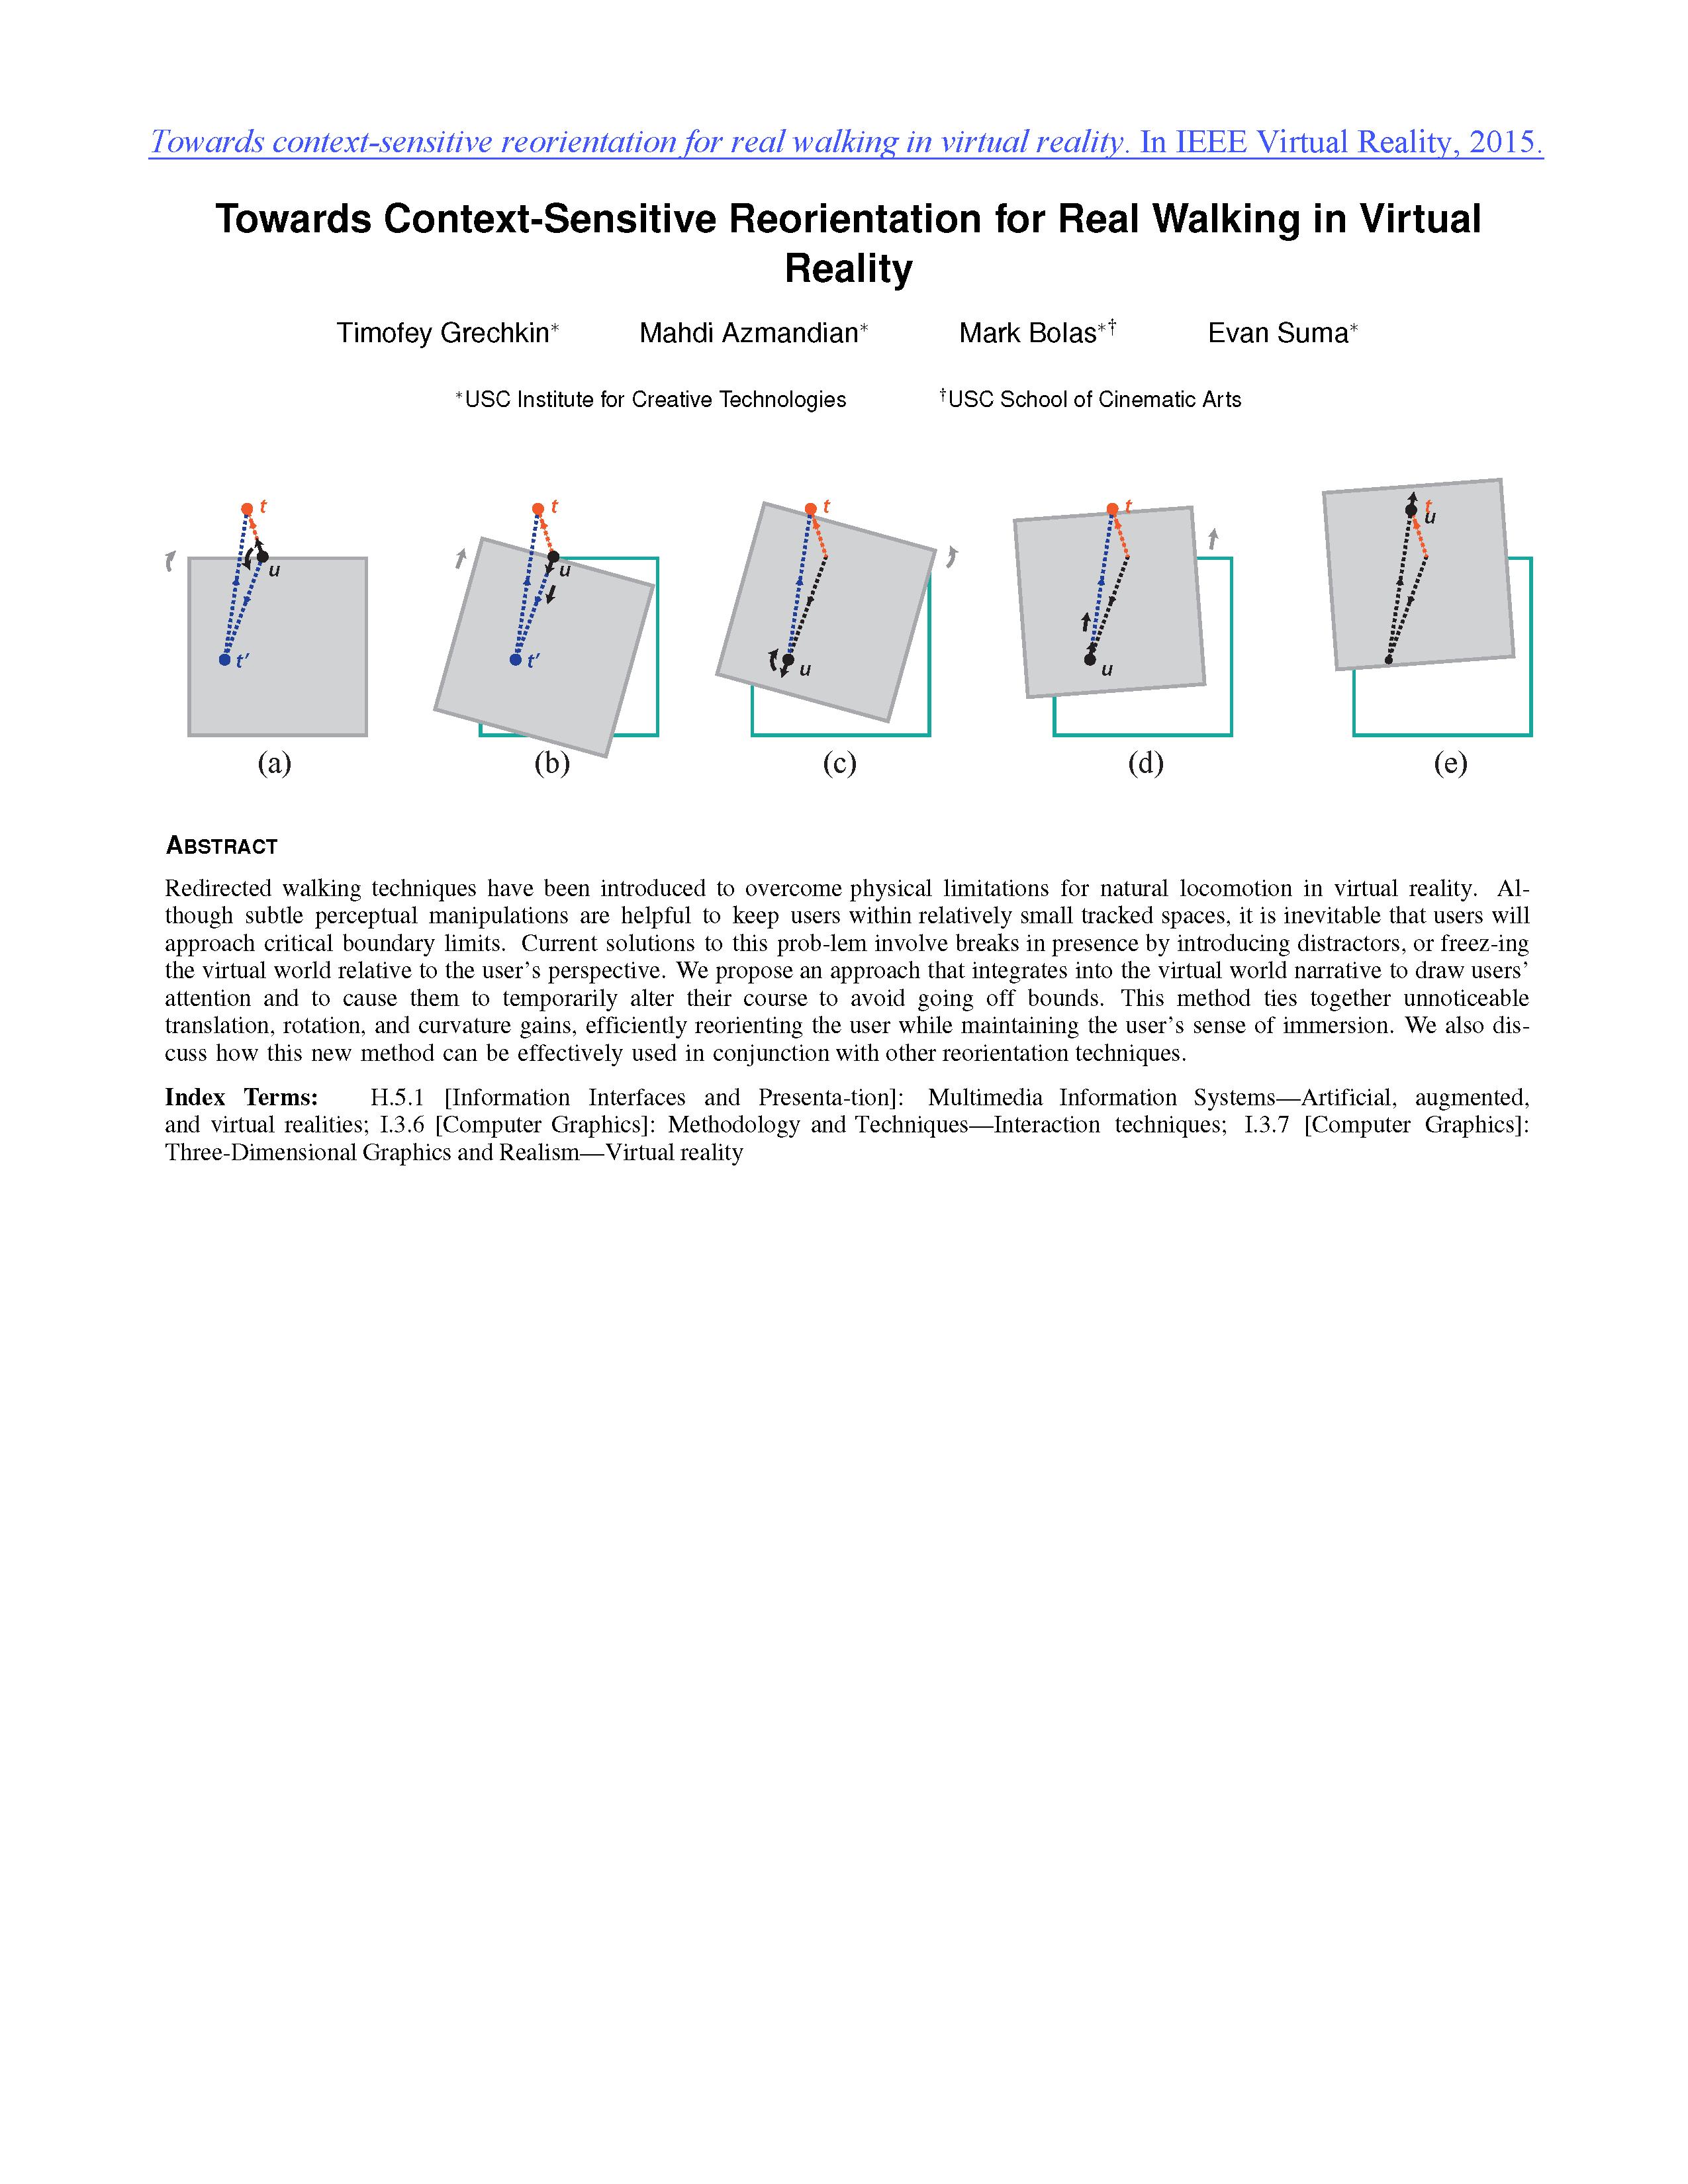 2015.03- Towards context-sensitive reorientation for real walking in virtual reality_TOP SHEET.png